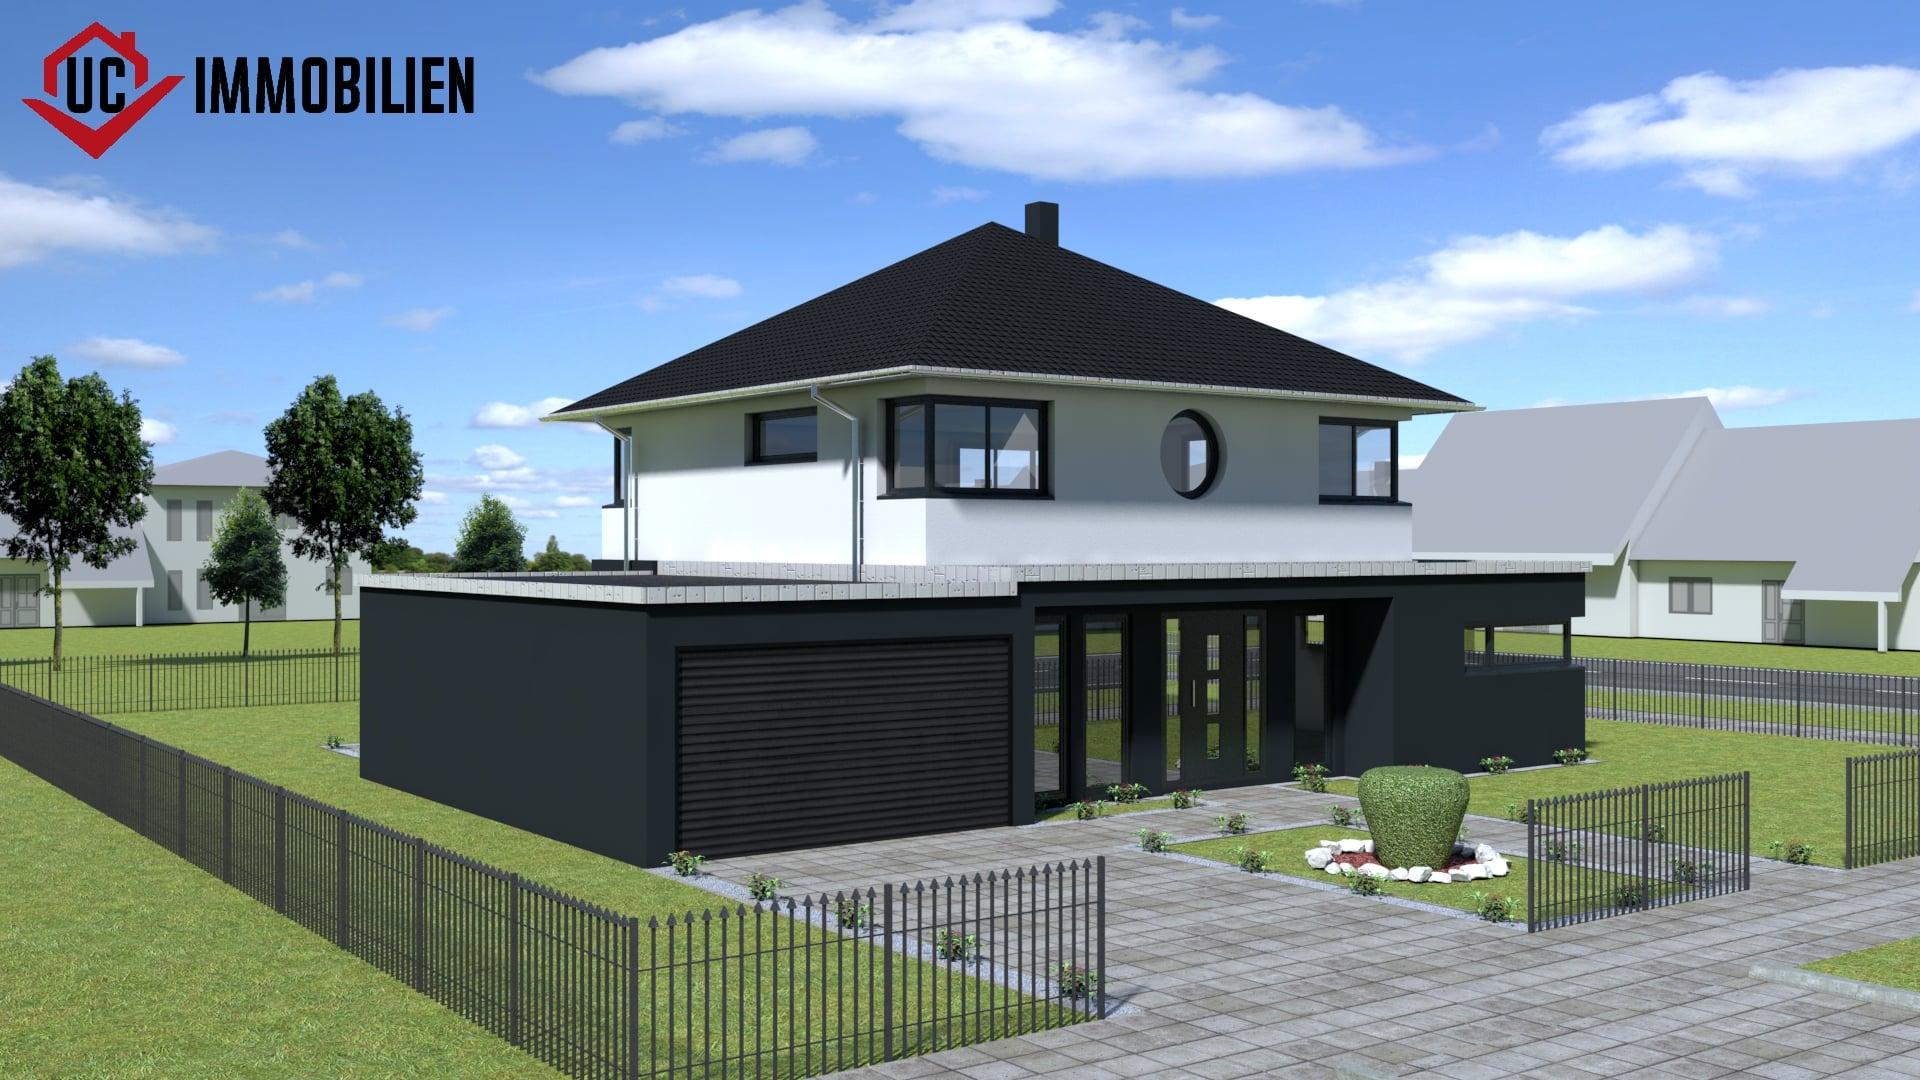 Referenz – Worpswede Einfamilienhaus – UC Immobilien